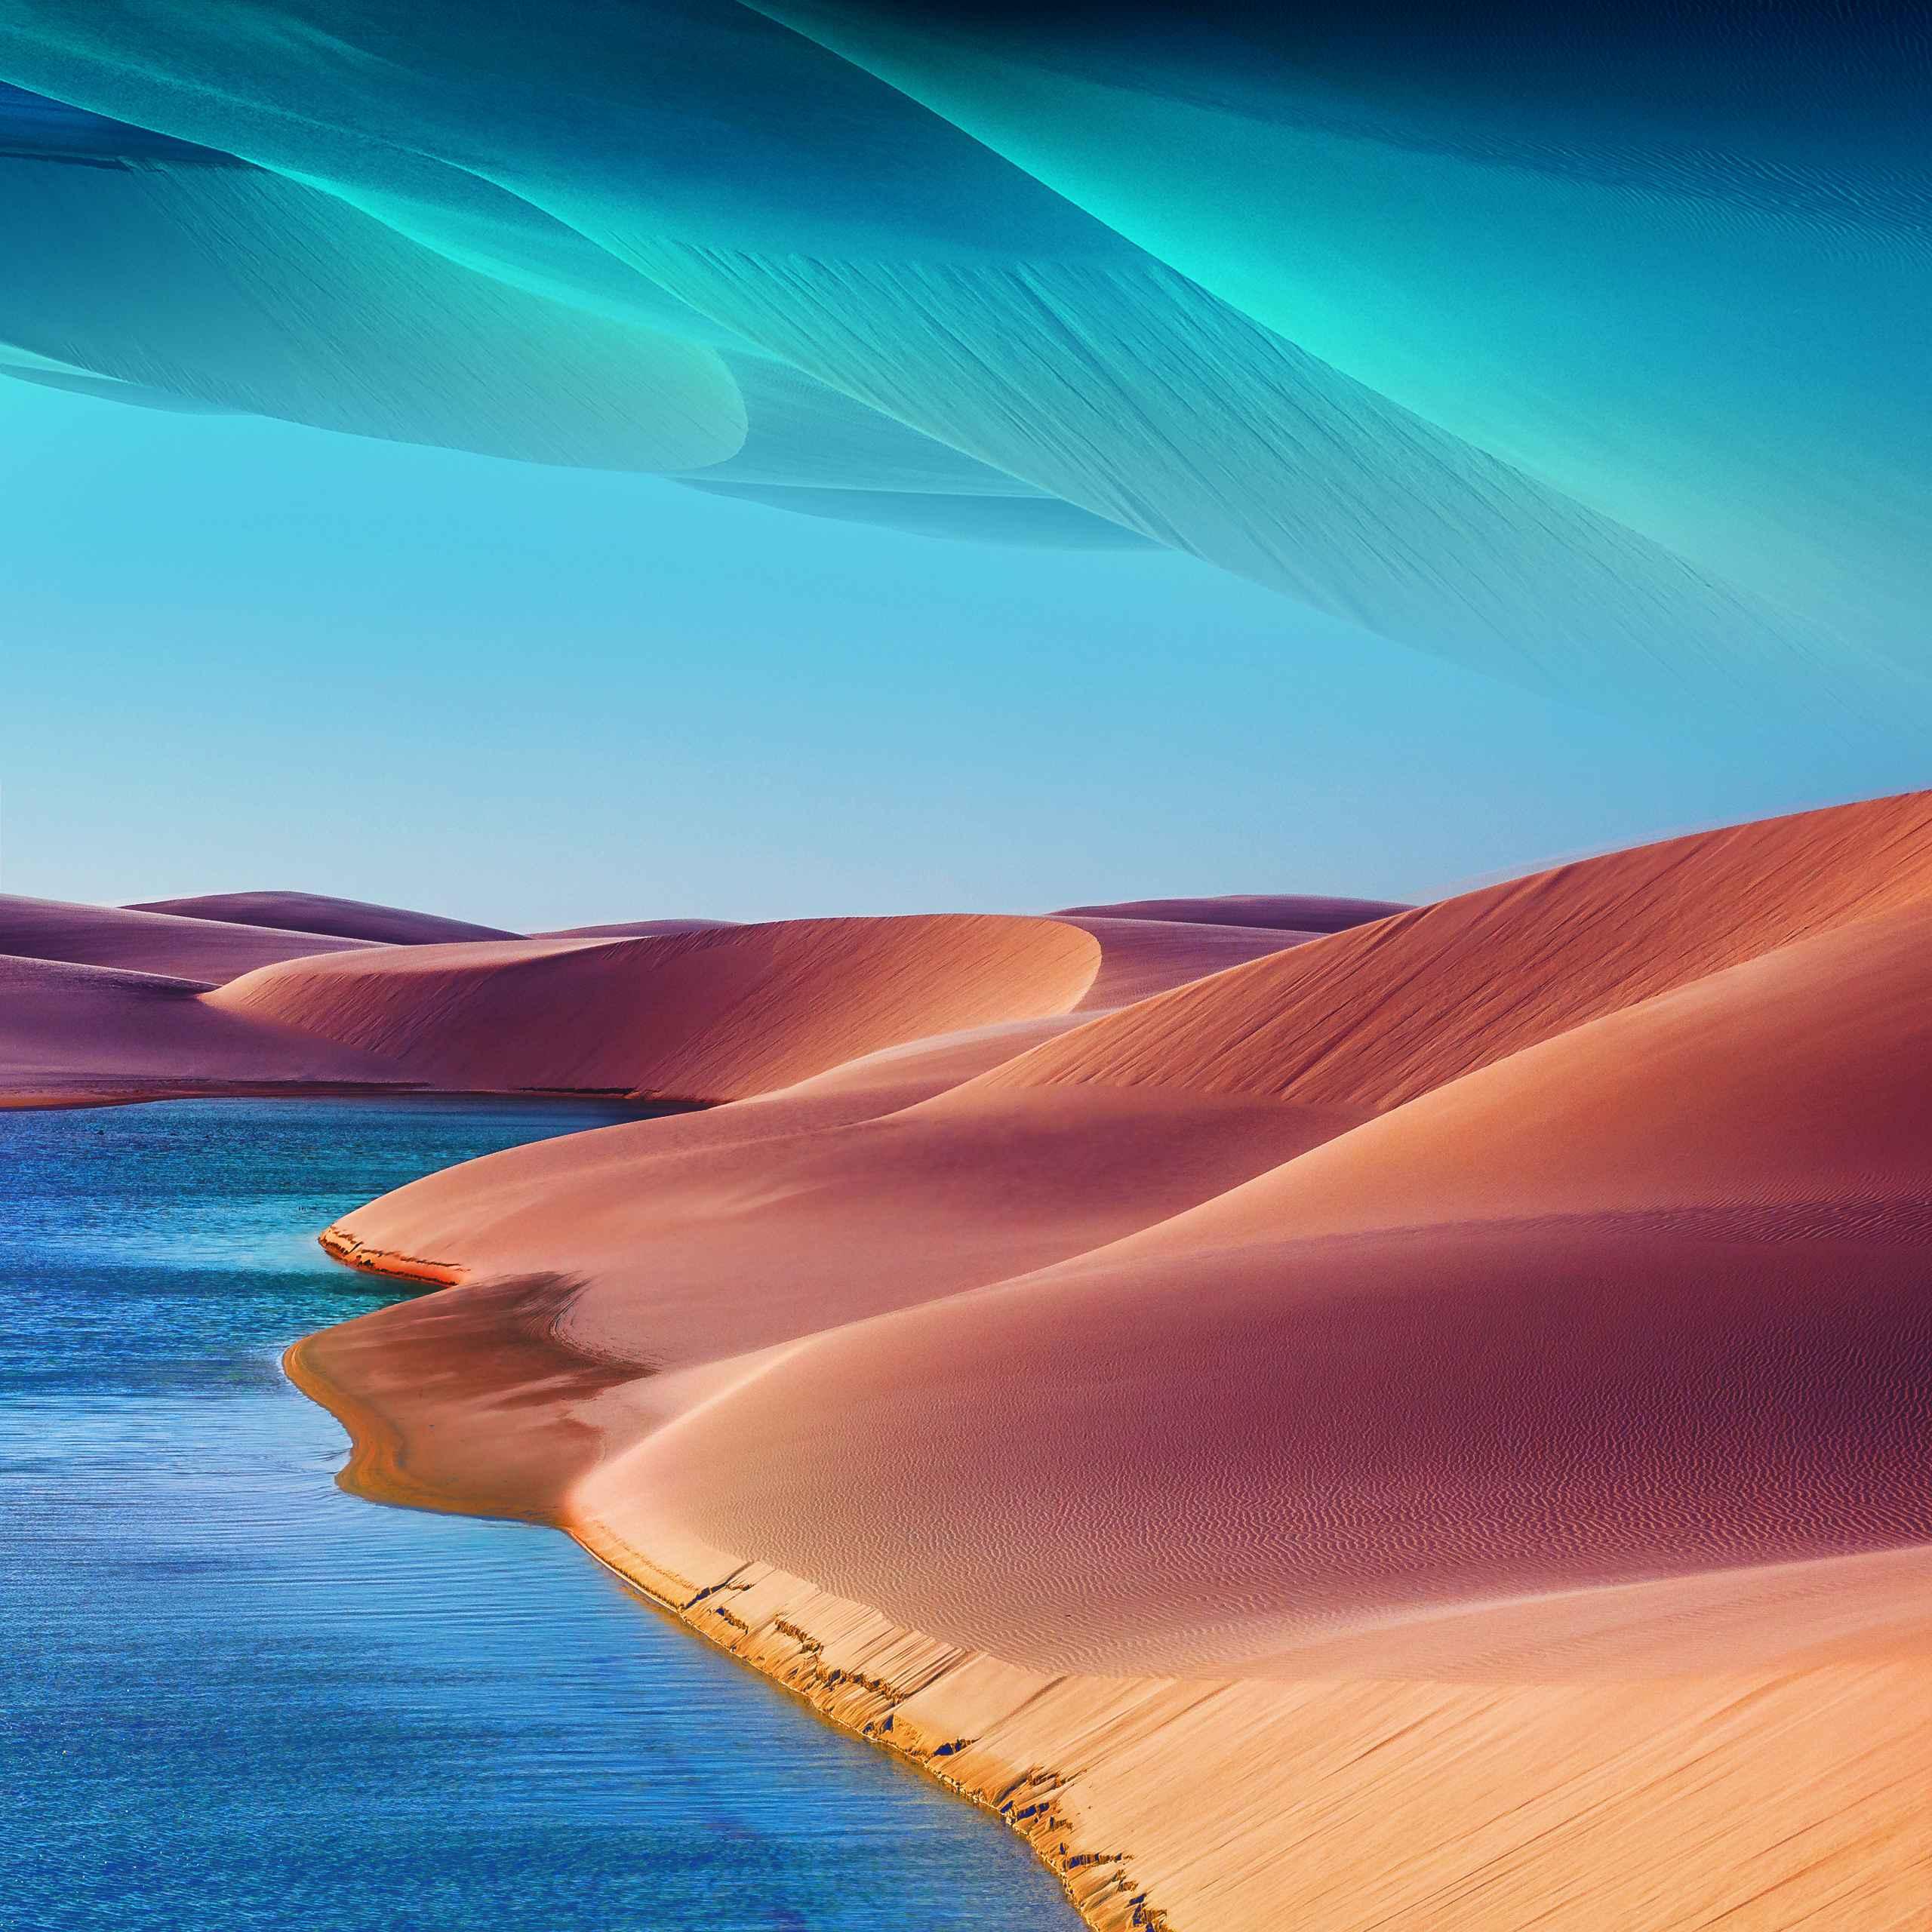 Download Samsung Galaxy M10 Wallpapers DroidViews 2560x2560